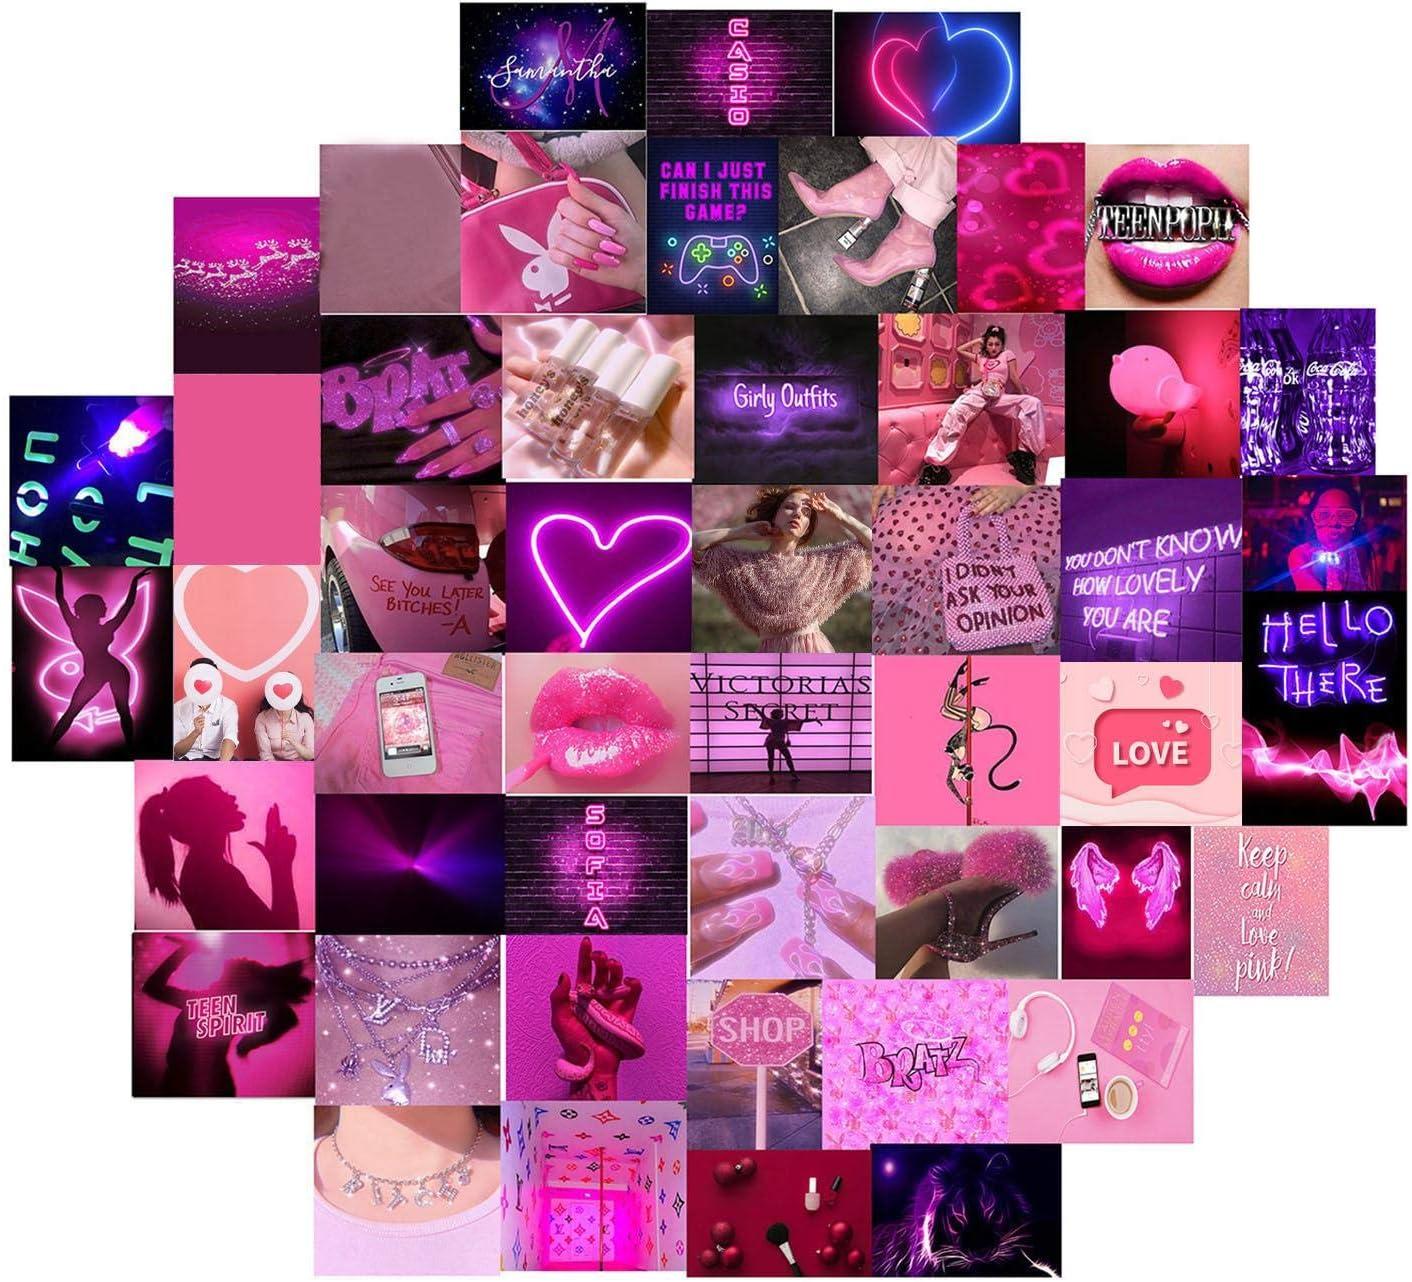 aniceday 50pcs Wall Collage Kit Exqusite Aesthetic Pósters Chic Collage Kit, Pink Photo Art Pictures Kit De Collage para Decoración De La Habitación - Colección De Fotos De 4x6 Pulgadas